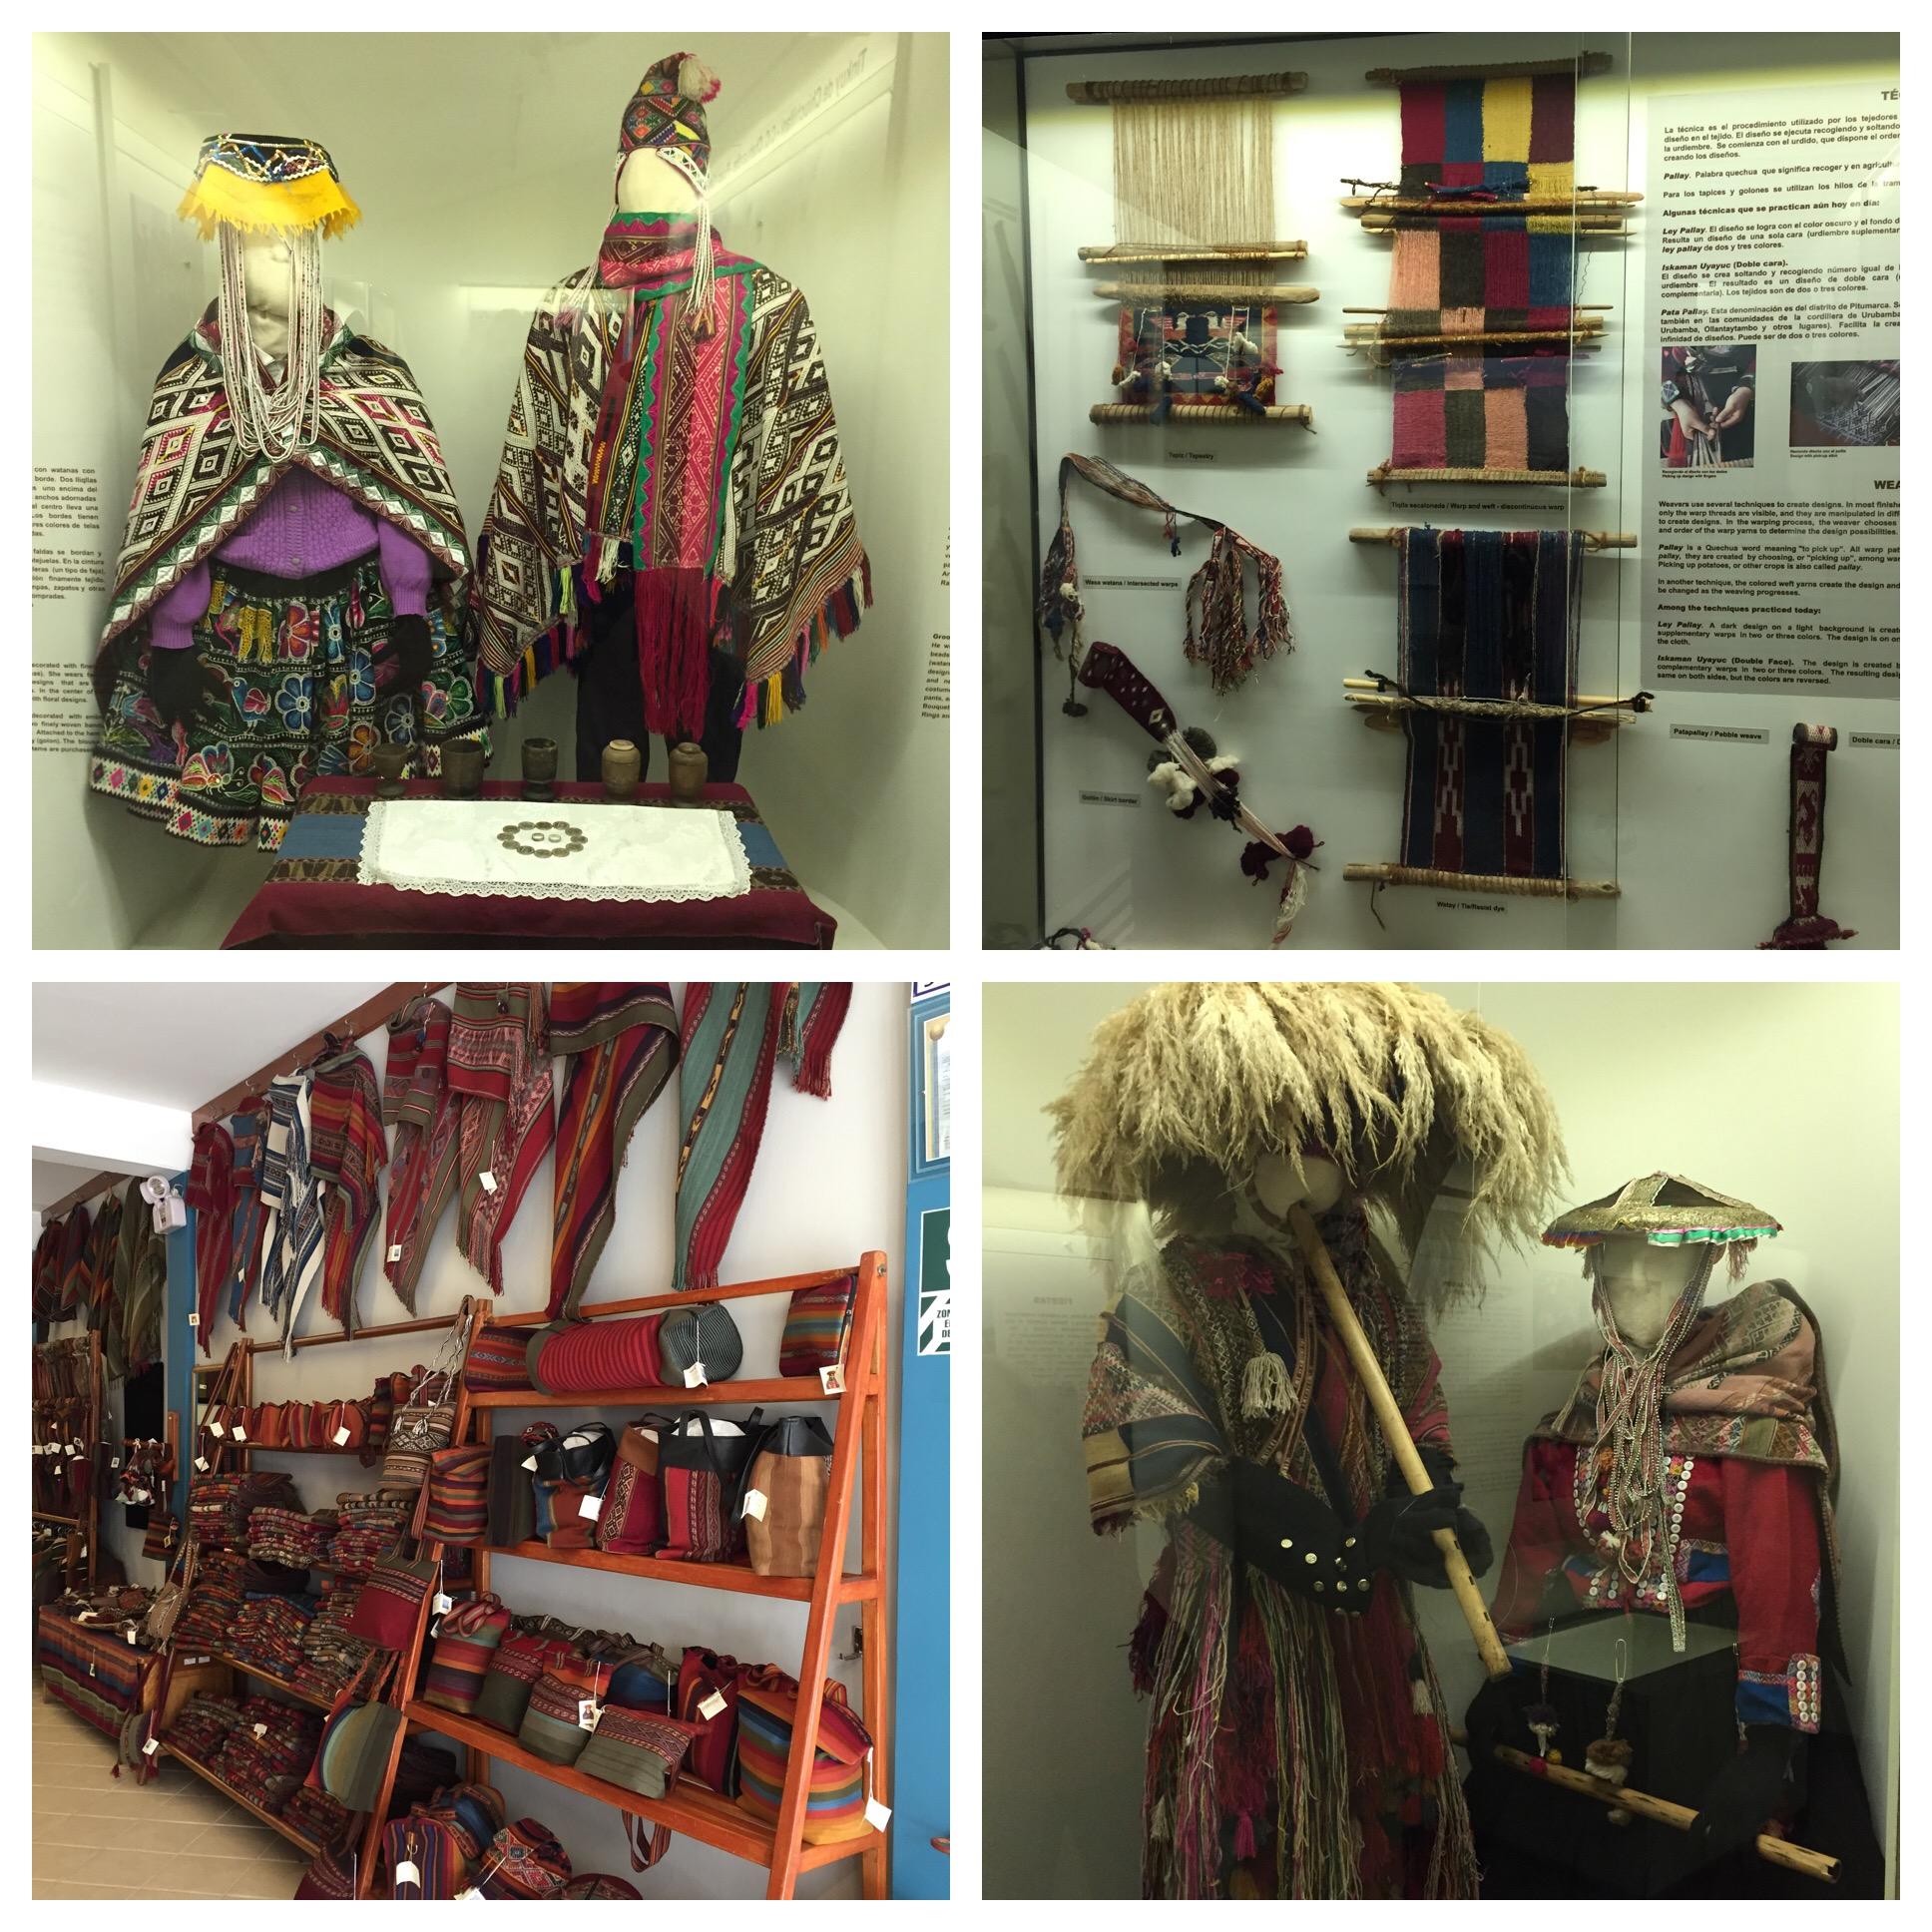 Top right is traditional Peruvian wedding attire, bottom left Fiesta Costumes.